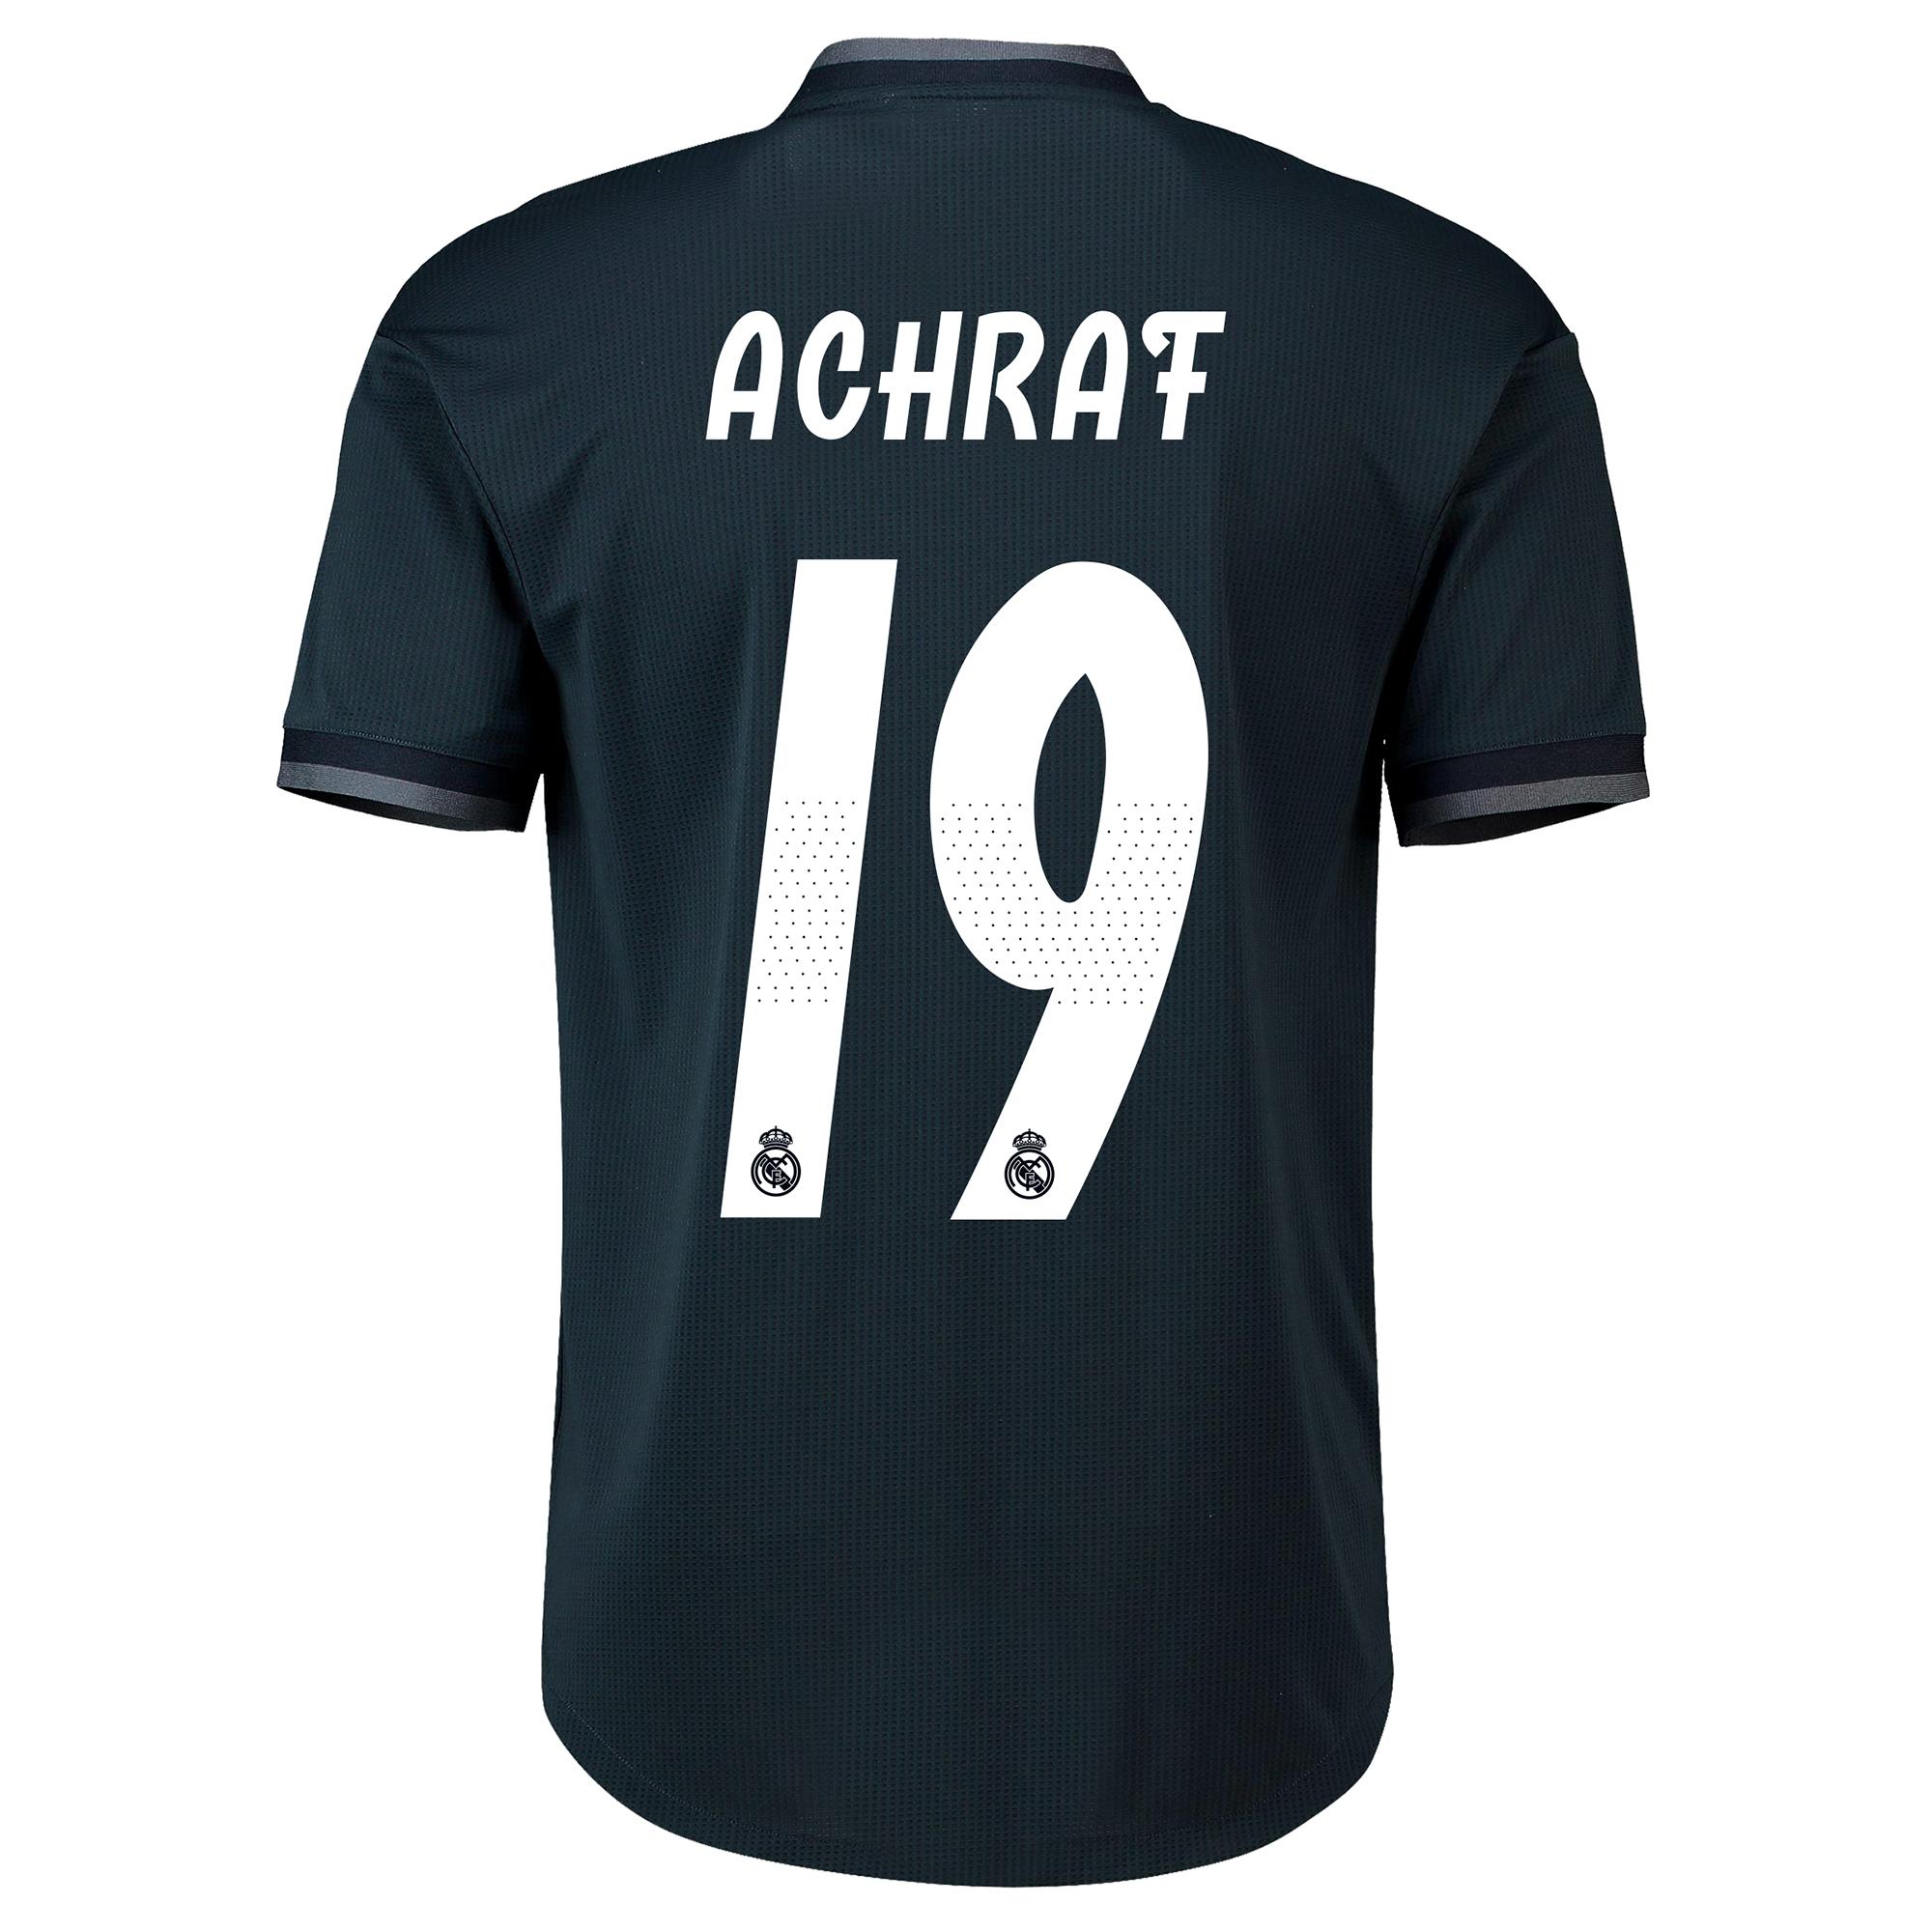 Image of Real Madrid Away Adi Zero Shirt 2018-19 with Achraf 19 printing